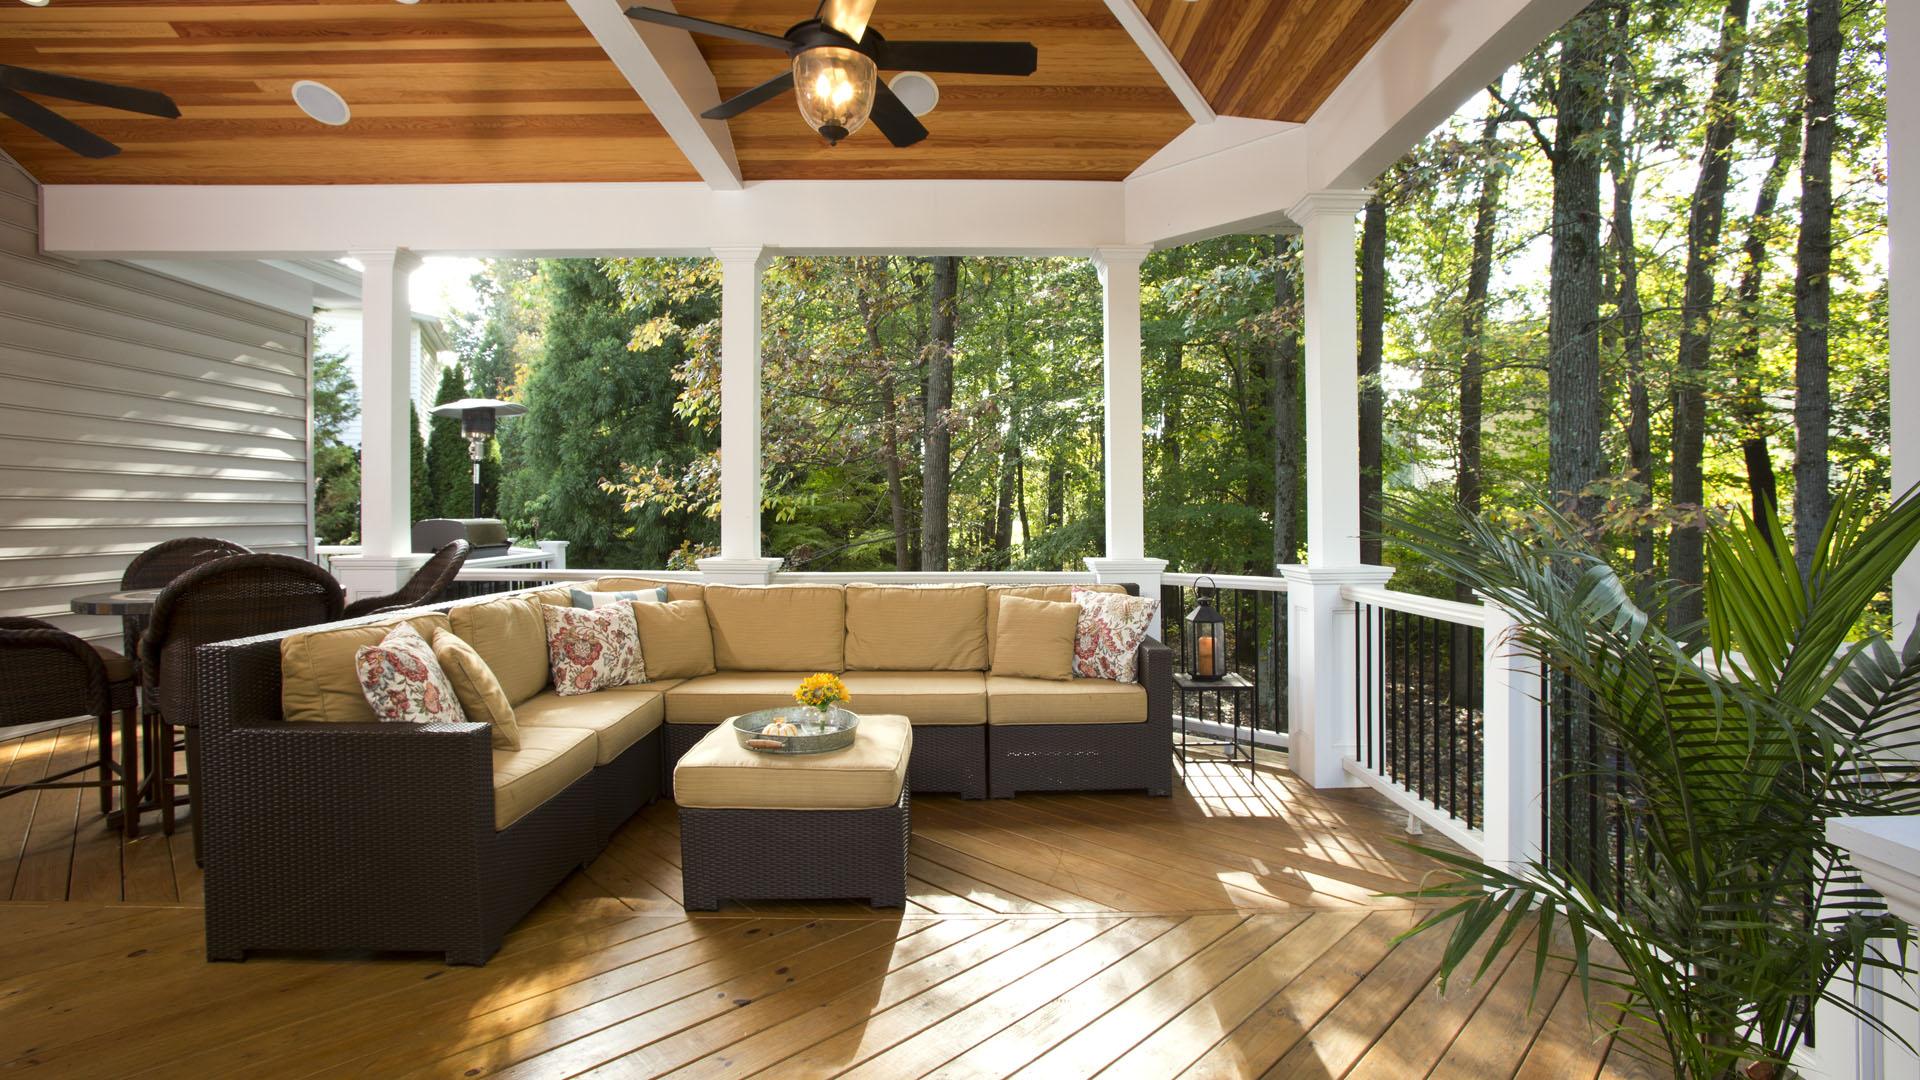 2015 Chrysalis Award South Region Winner, Residential Exterior under $100,000